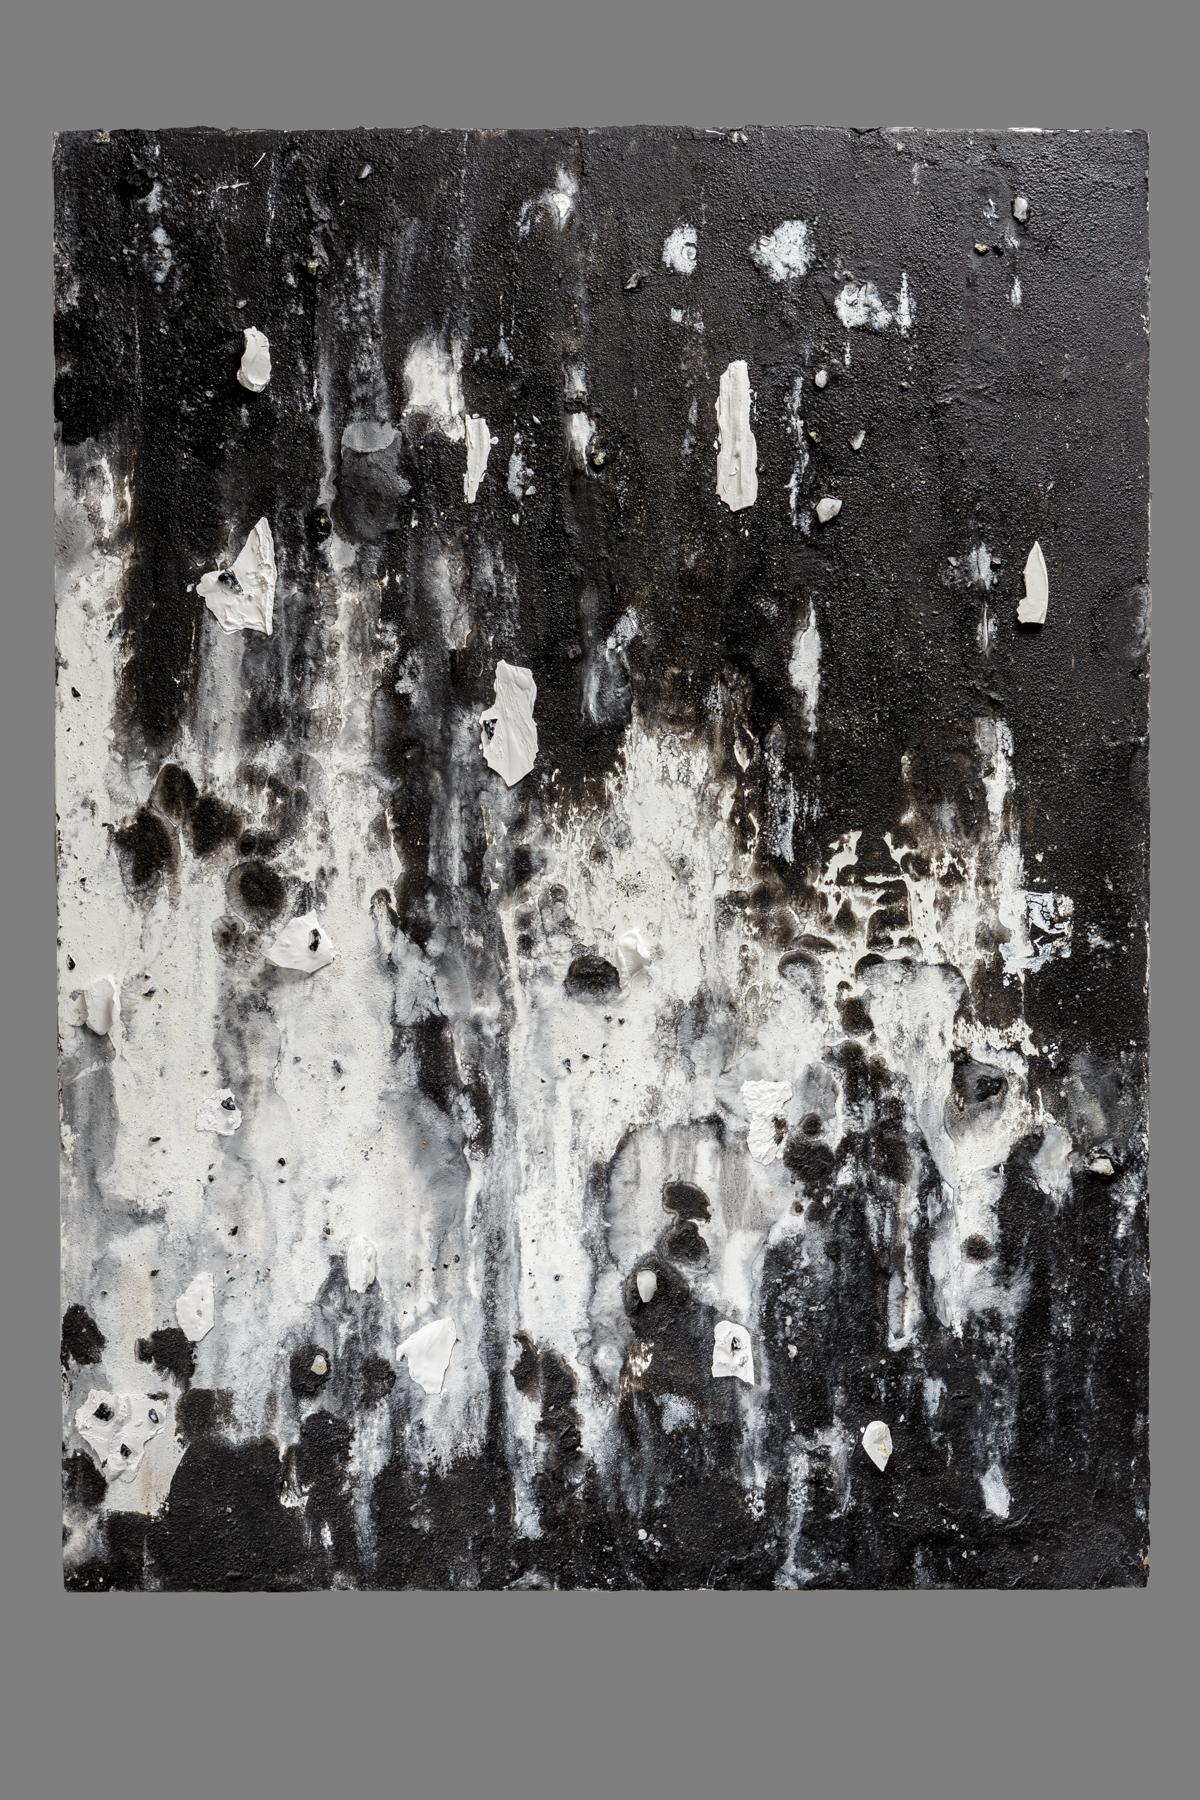 Noir  Oil, sand, wax, hydrocal fragments, quartz, obsidian and citrine 48 x 36 in. / 121.9 x 91.4 cm.